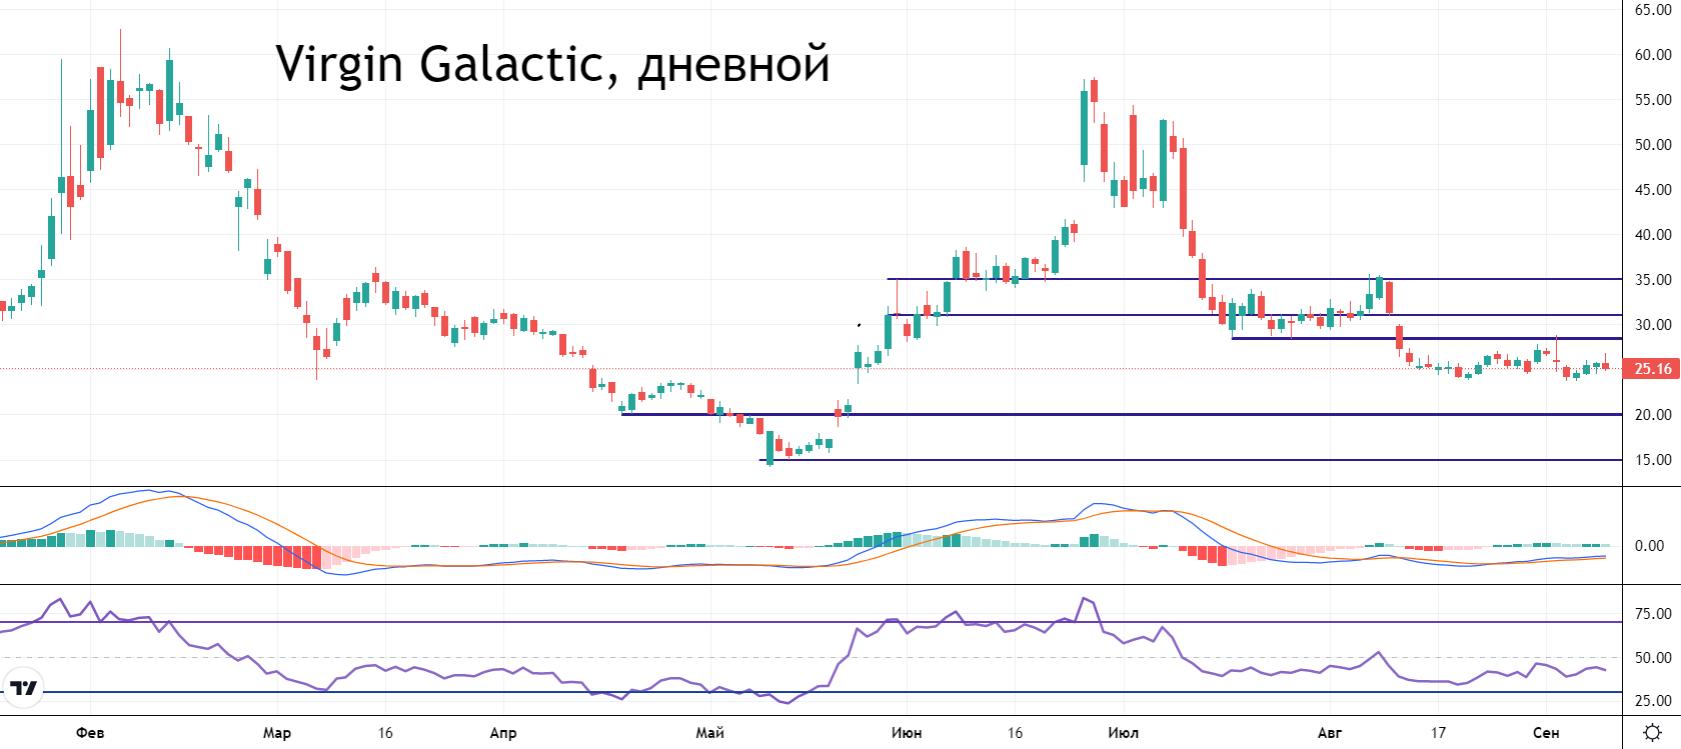 Virgin Galactic: «Аривидерчи» полету или почему падают акции